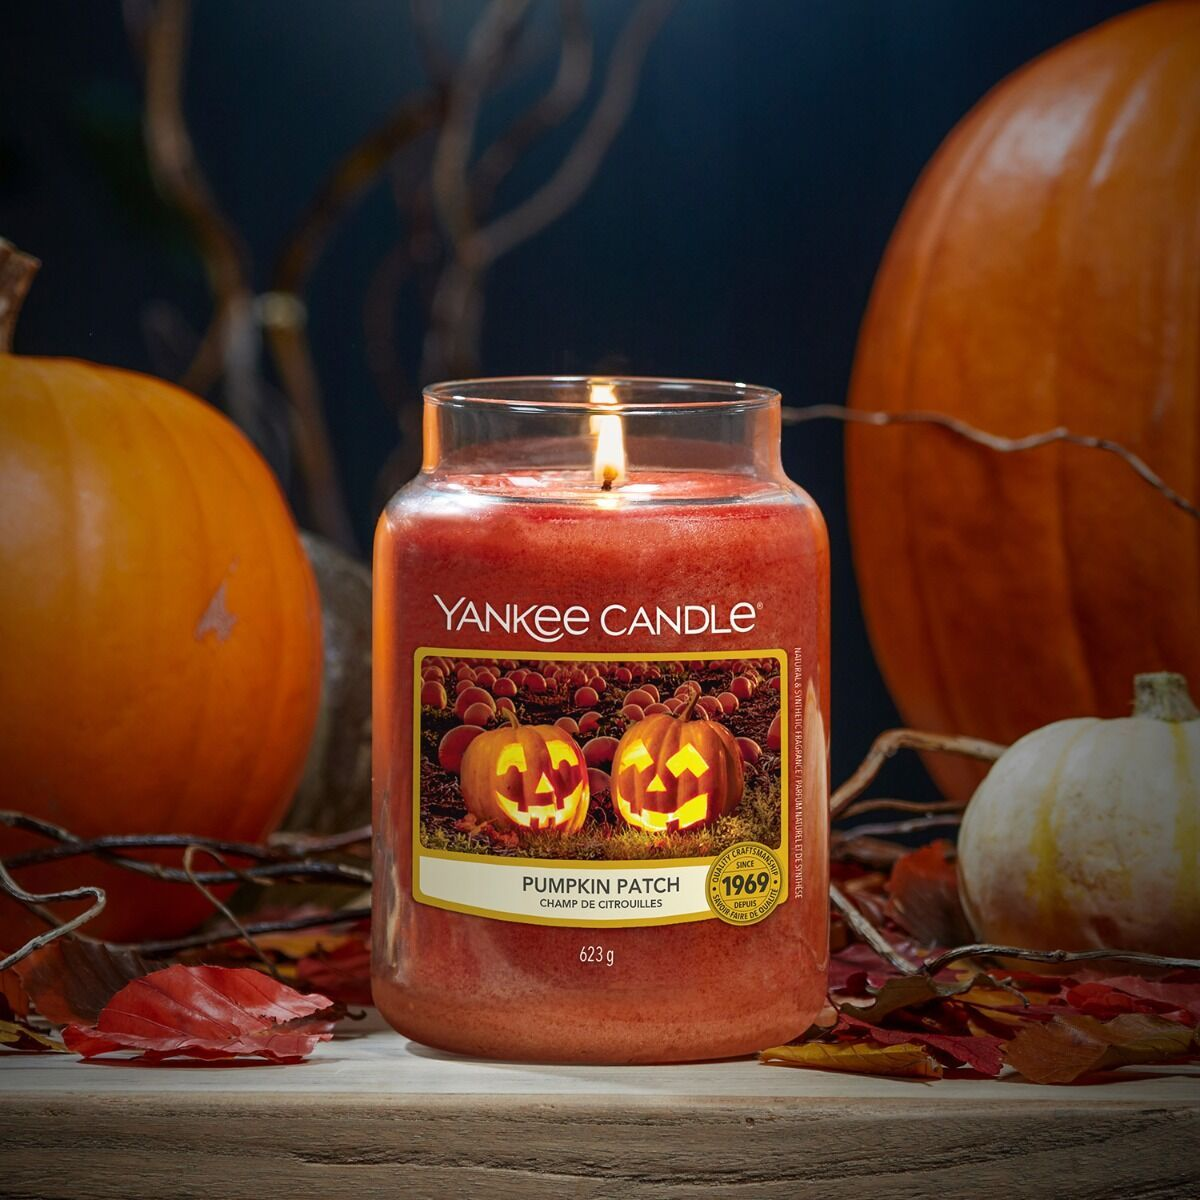 Yankee Candle Pumpkin